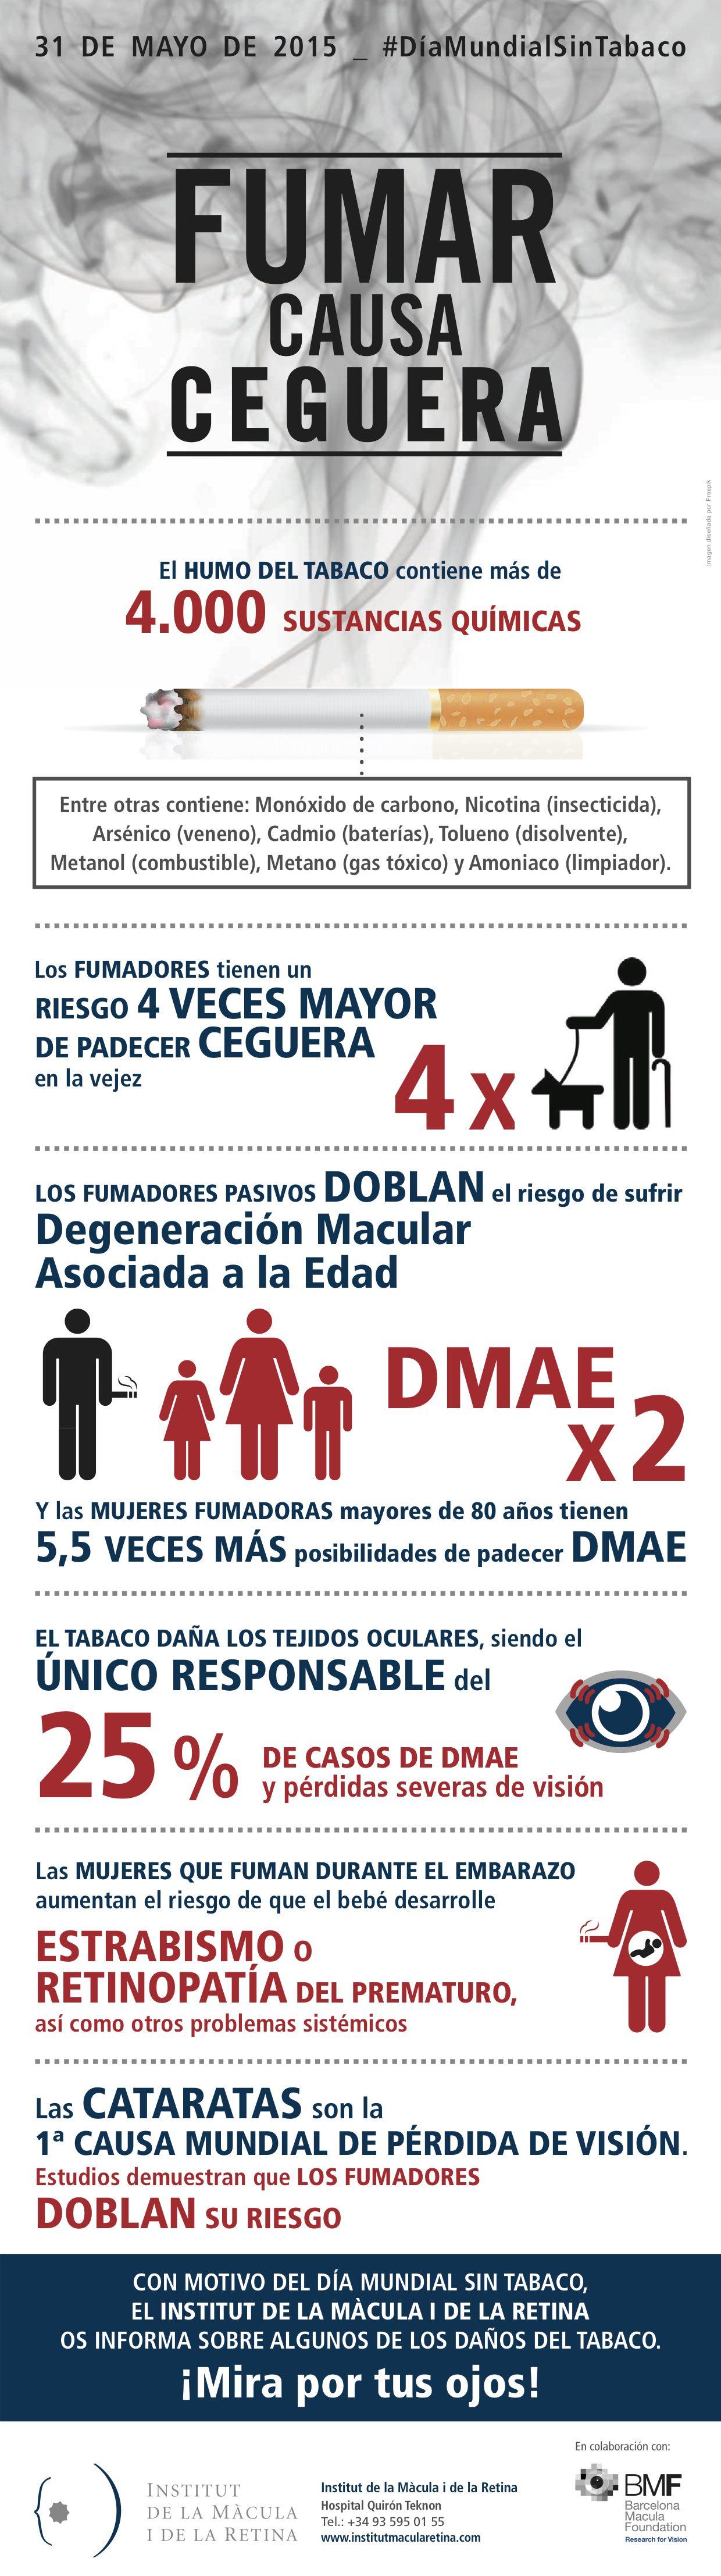 El Institut te muestra las ventajas de #vivirsintabaco